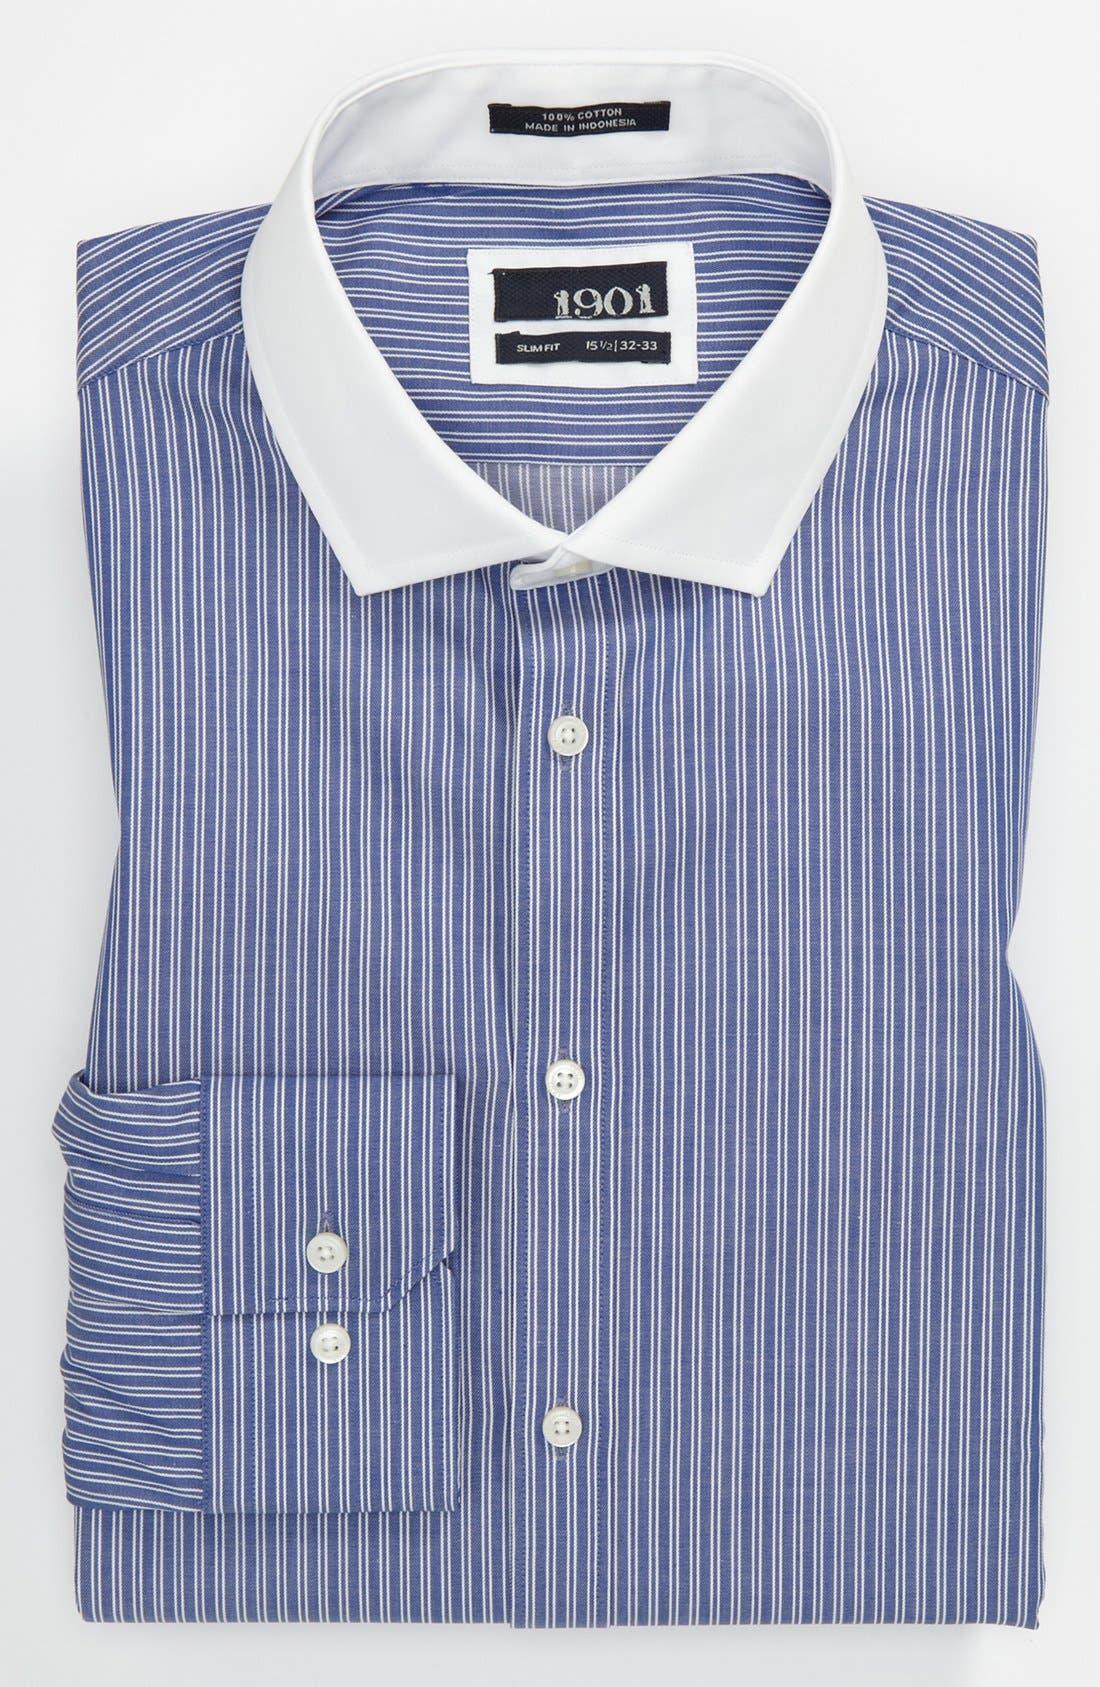 1901 Slim Fit Dress Shirt, Main, color, 400